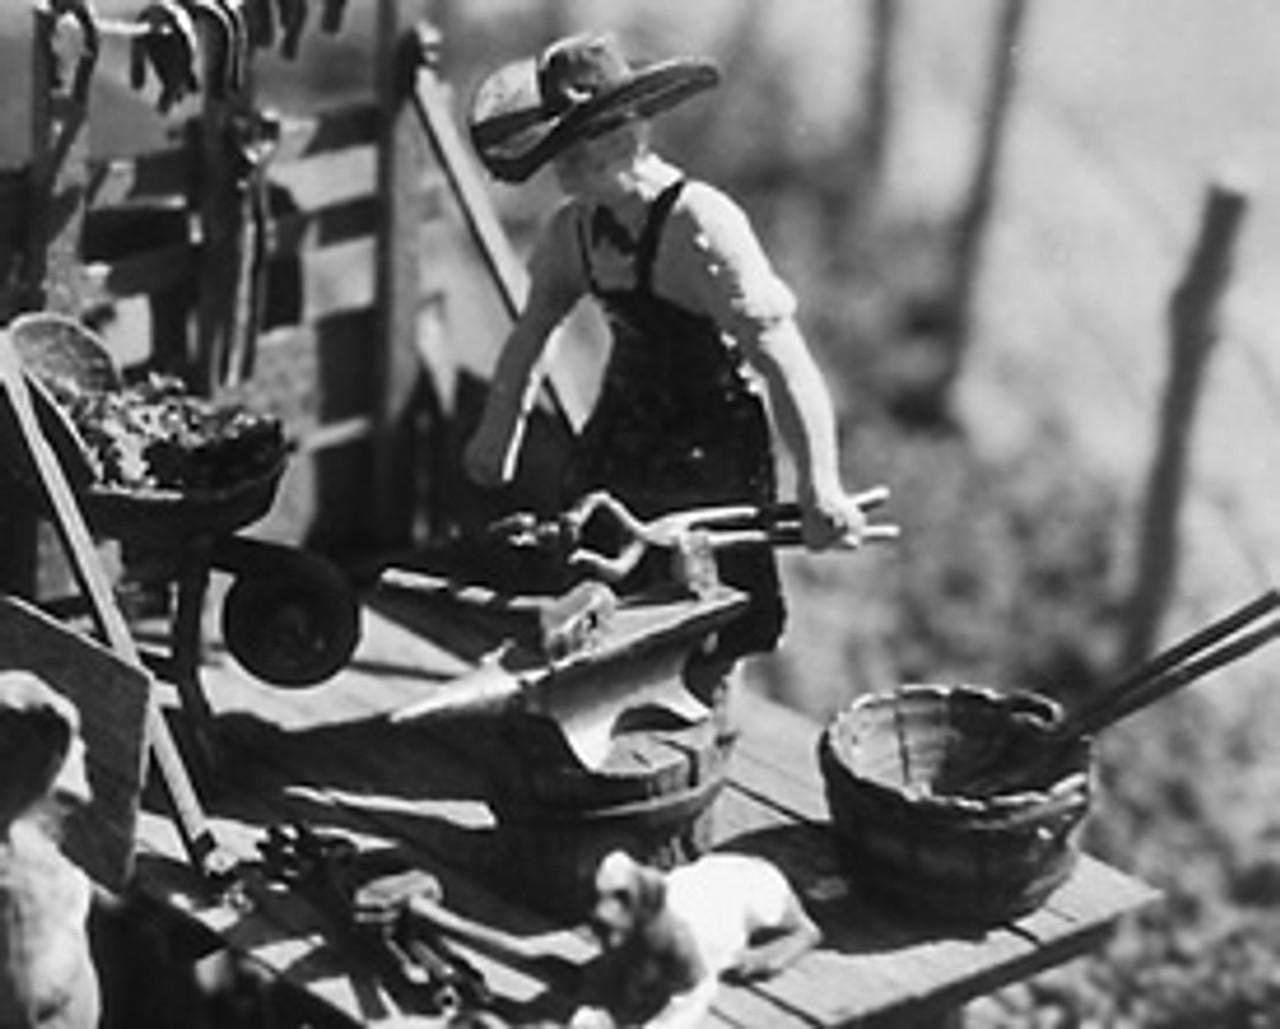 Blacksmith Tiny Tools & Equipment